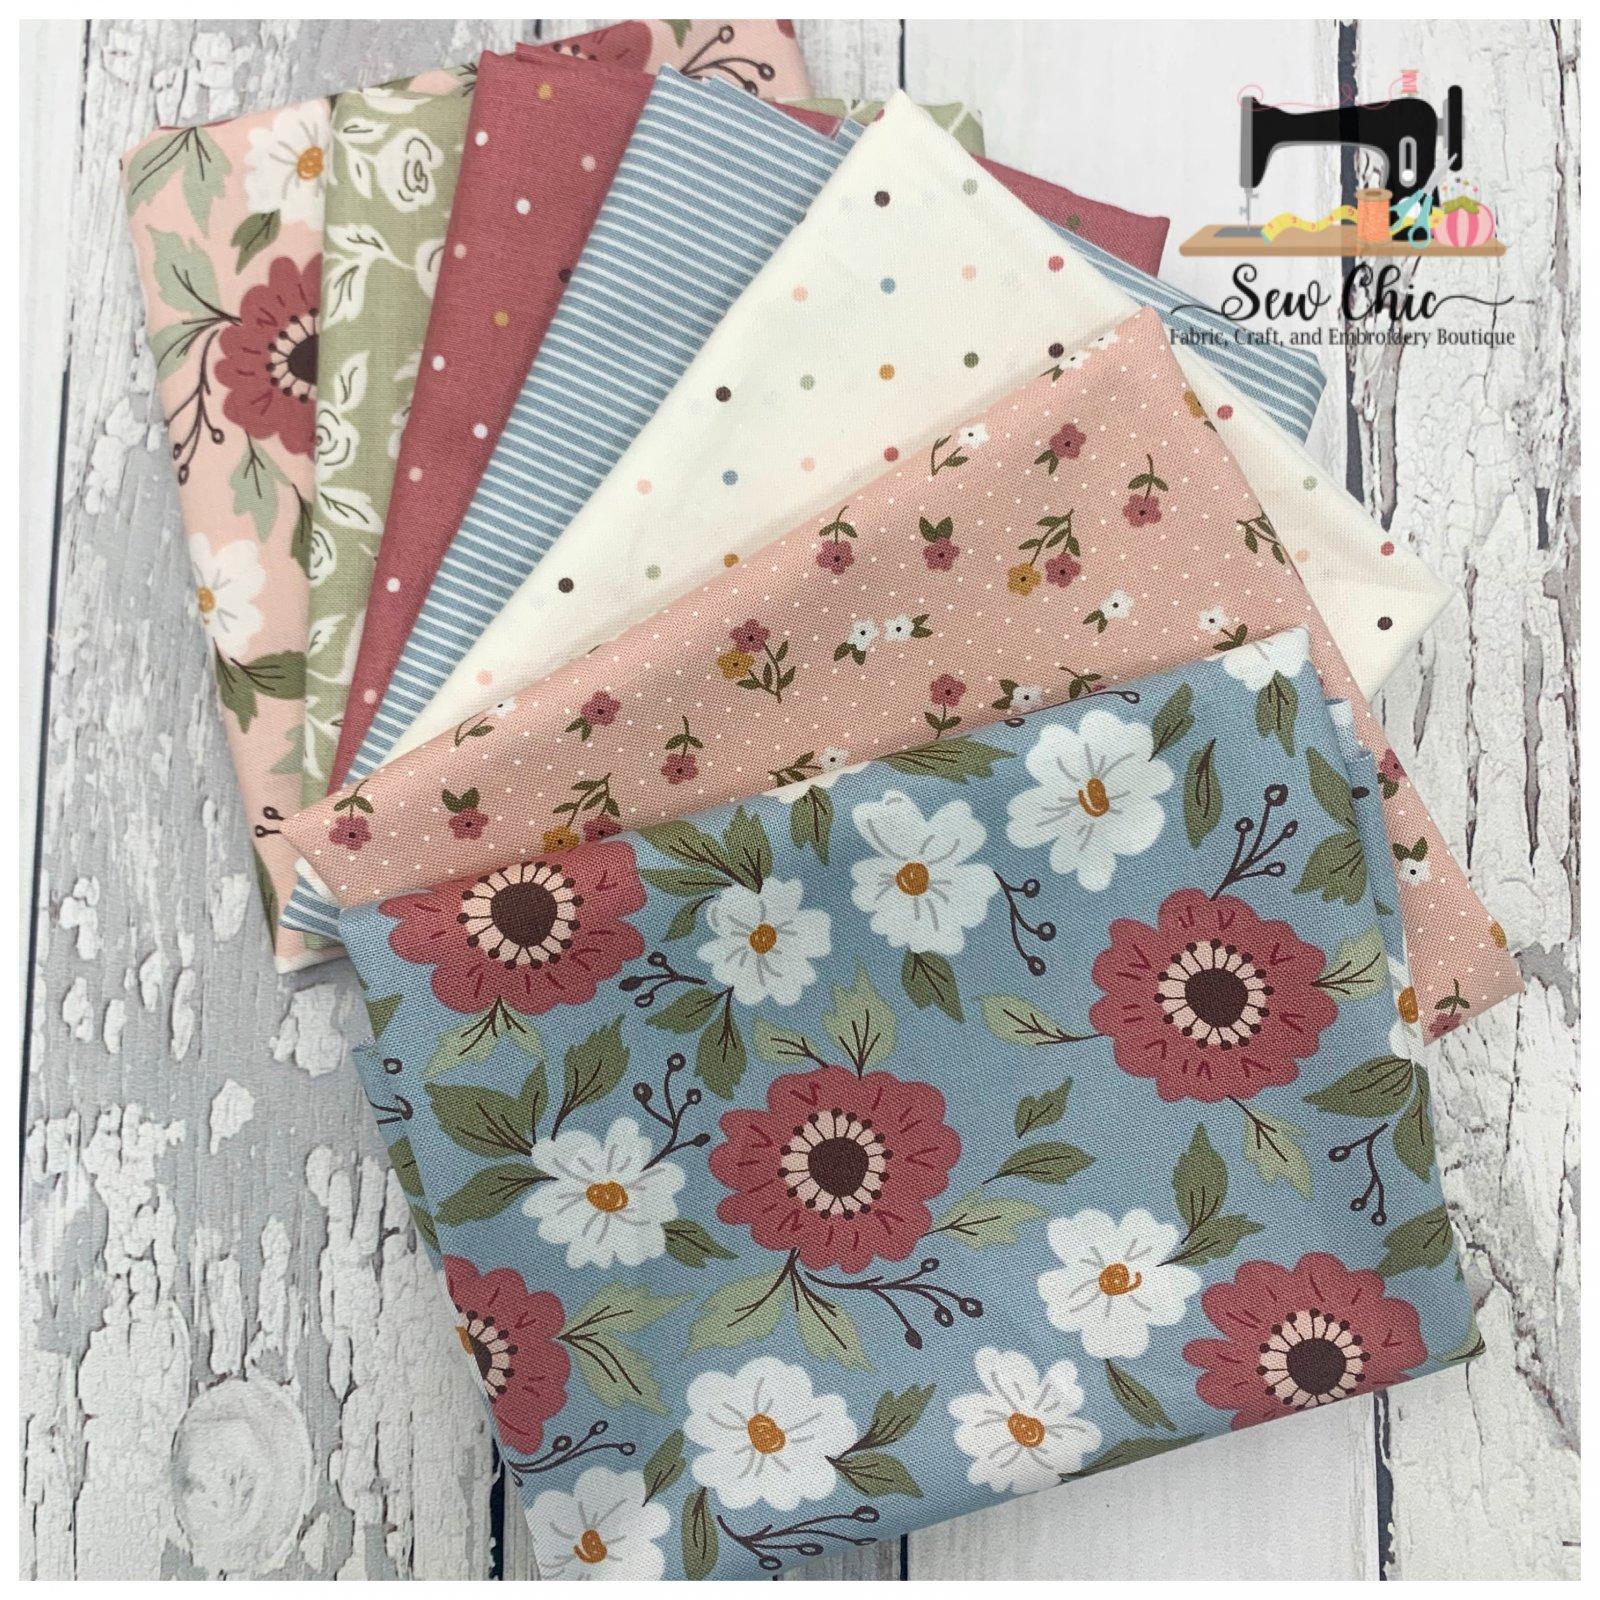 Folktale mini Fat Quarter Bundle 6 fabrics